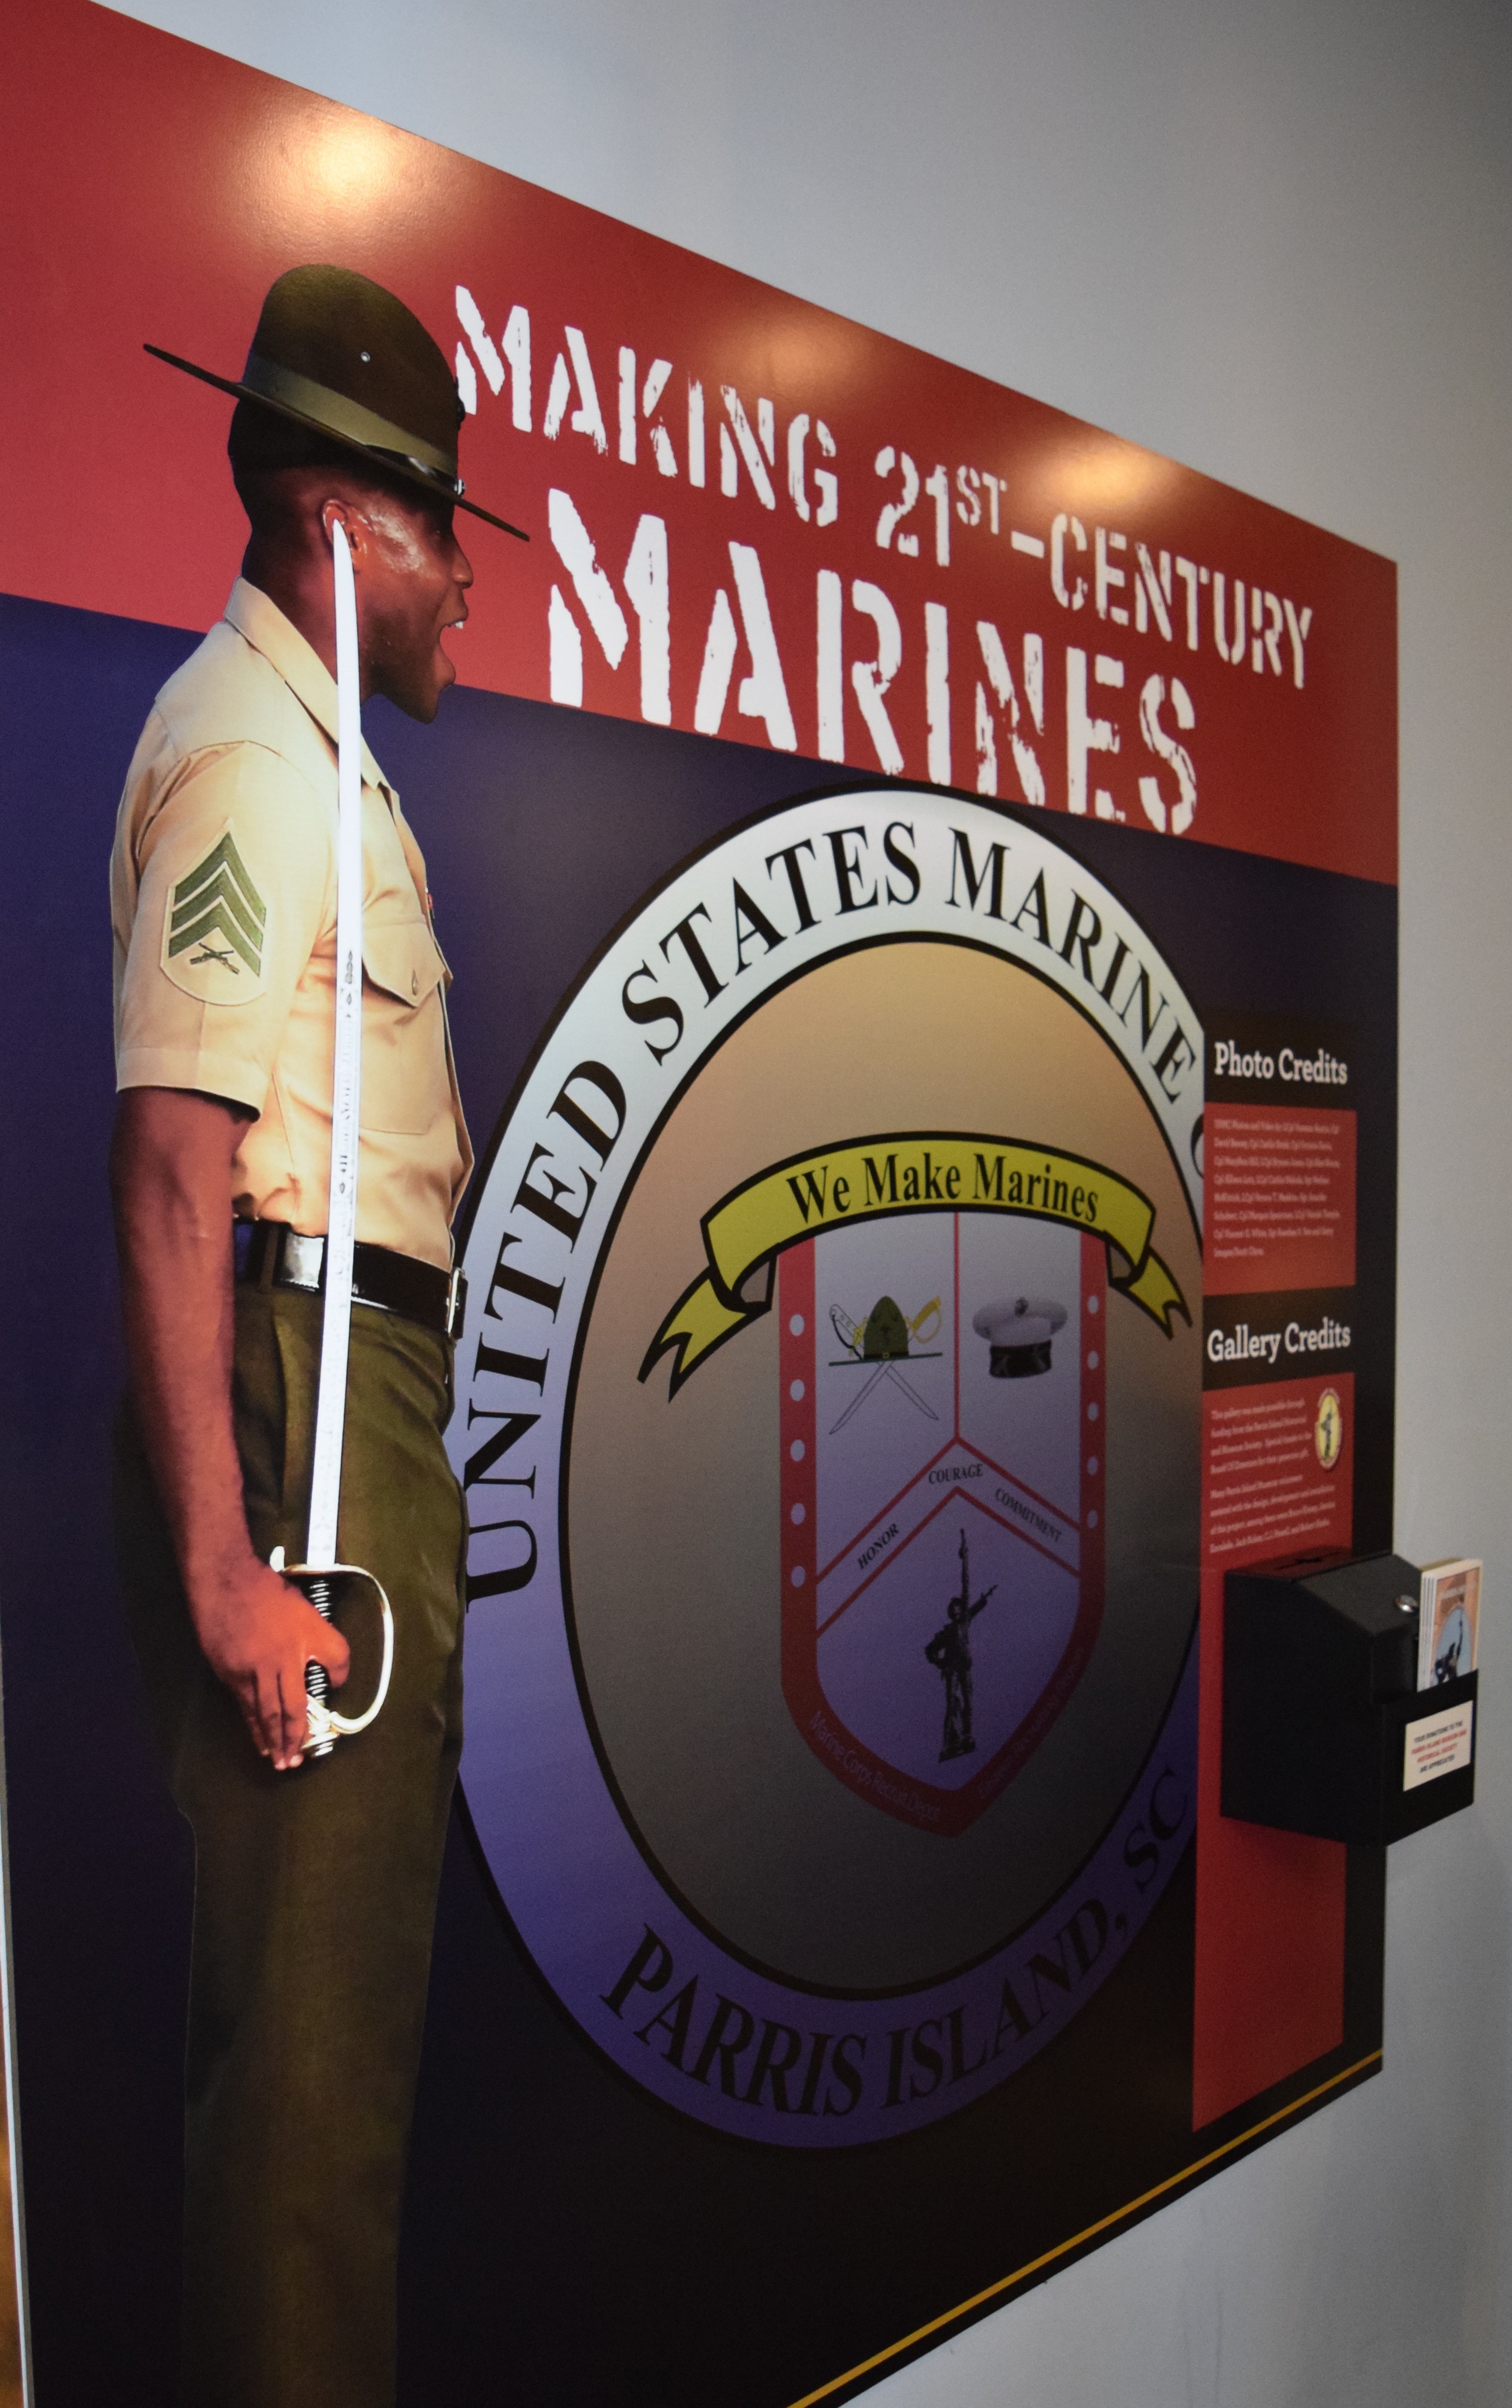 Beaufort signs-Parris Island Marine Corps Museum interpretative panels-